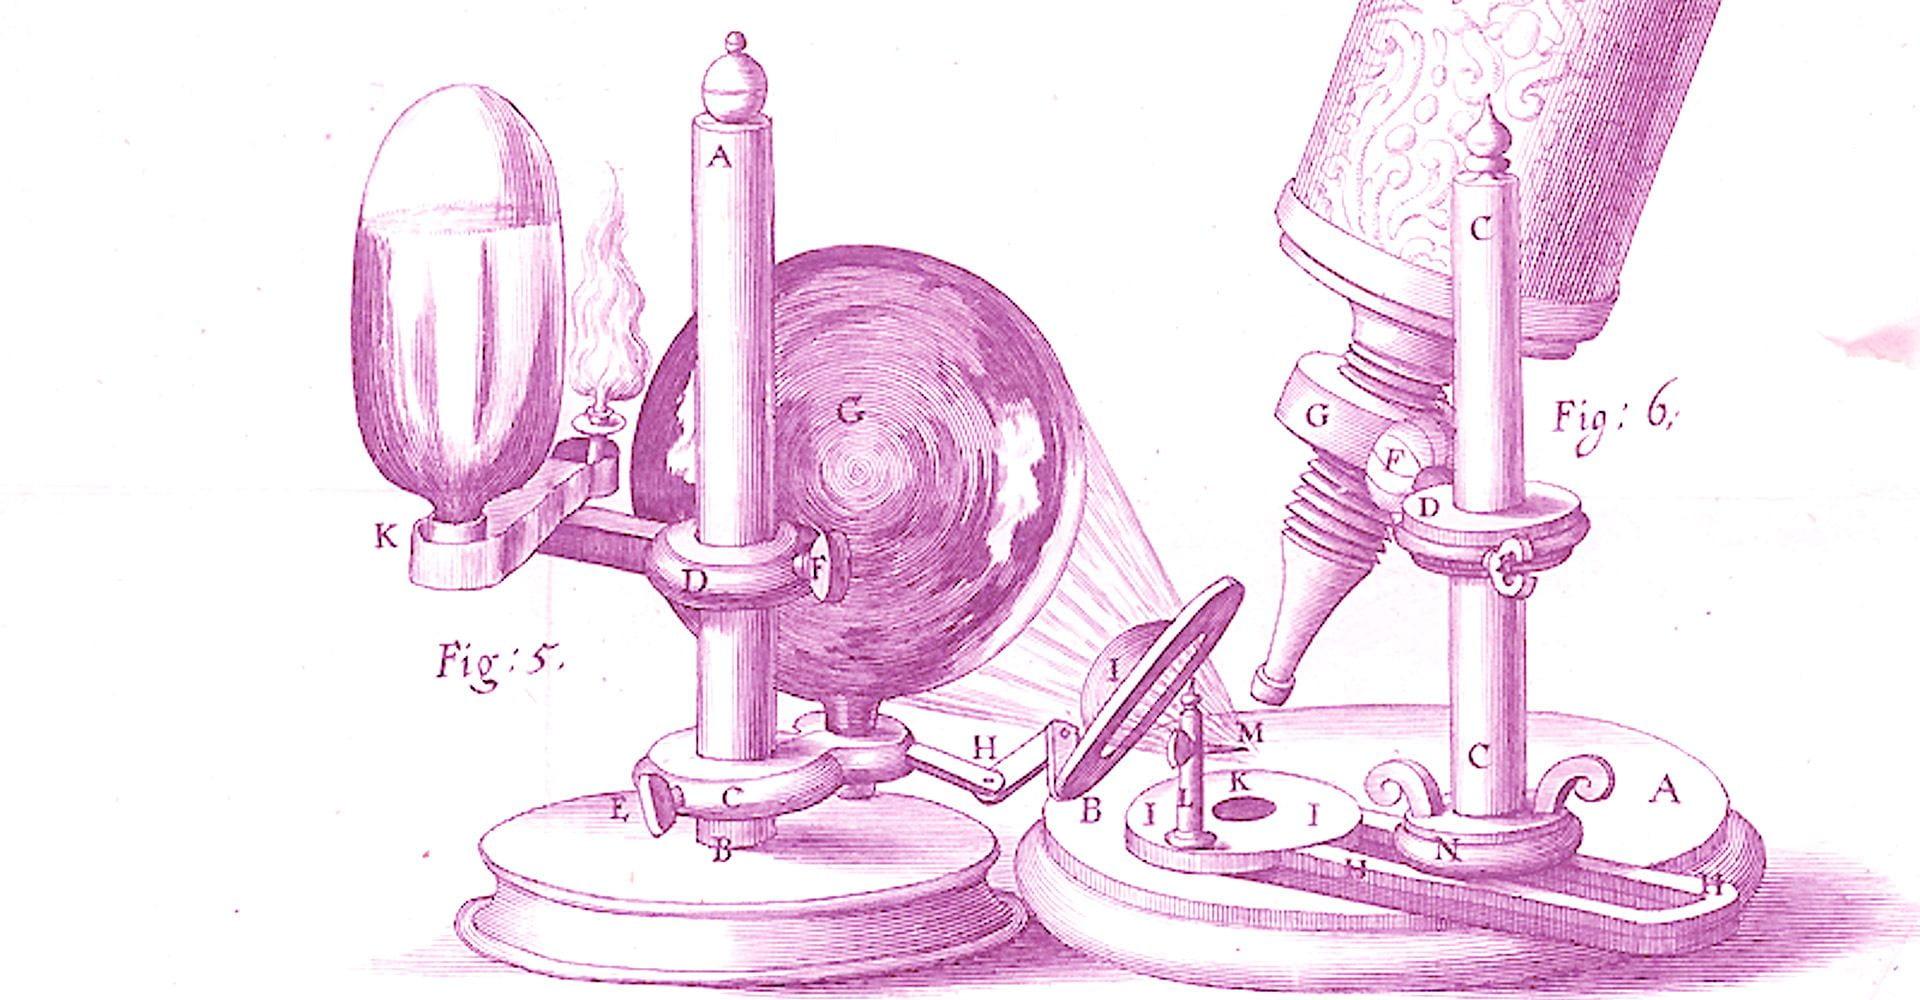 purple illustration of experiment